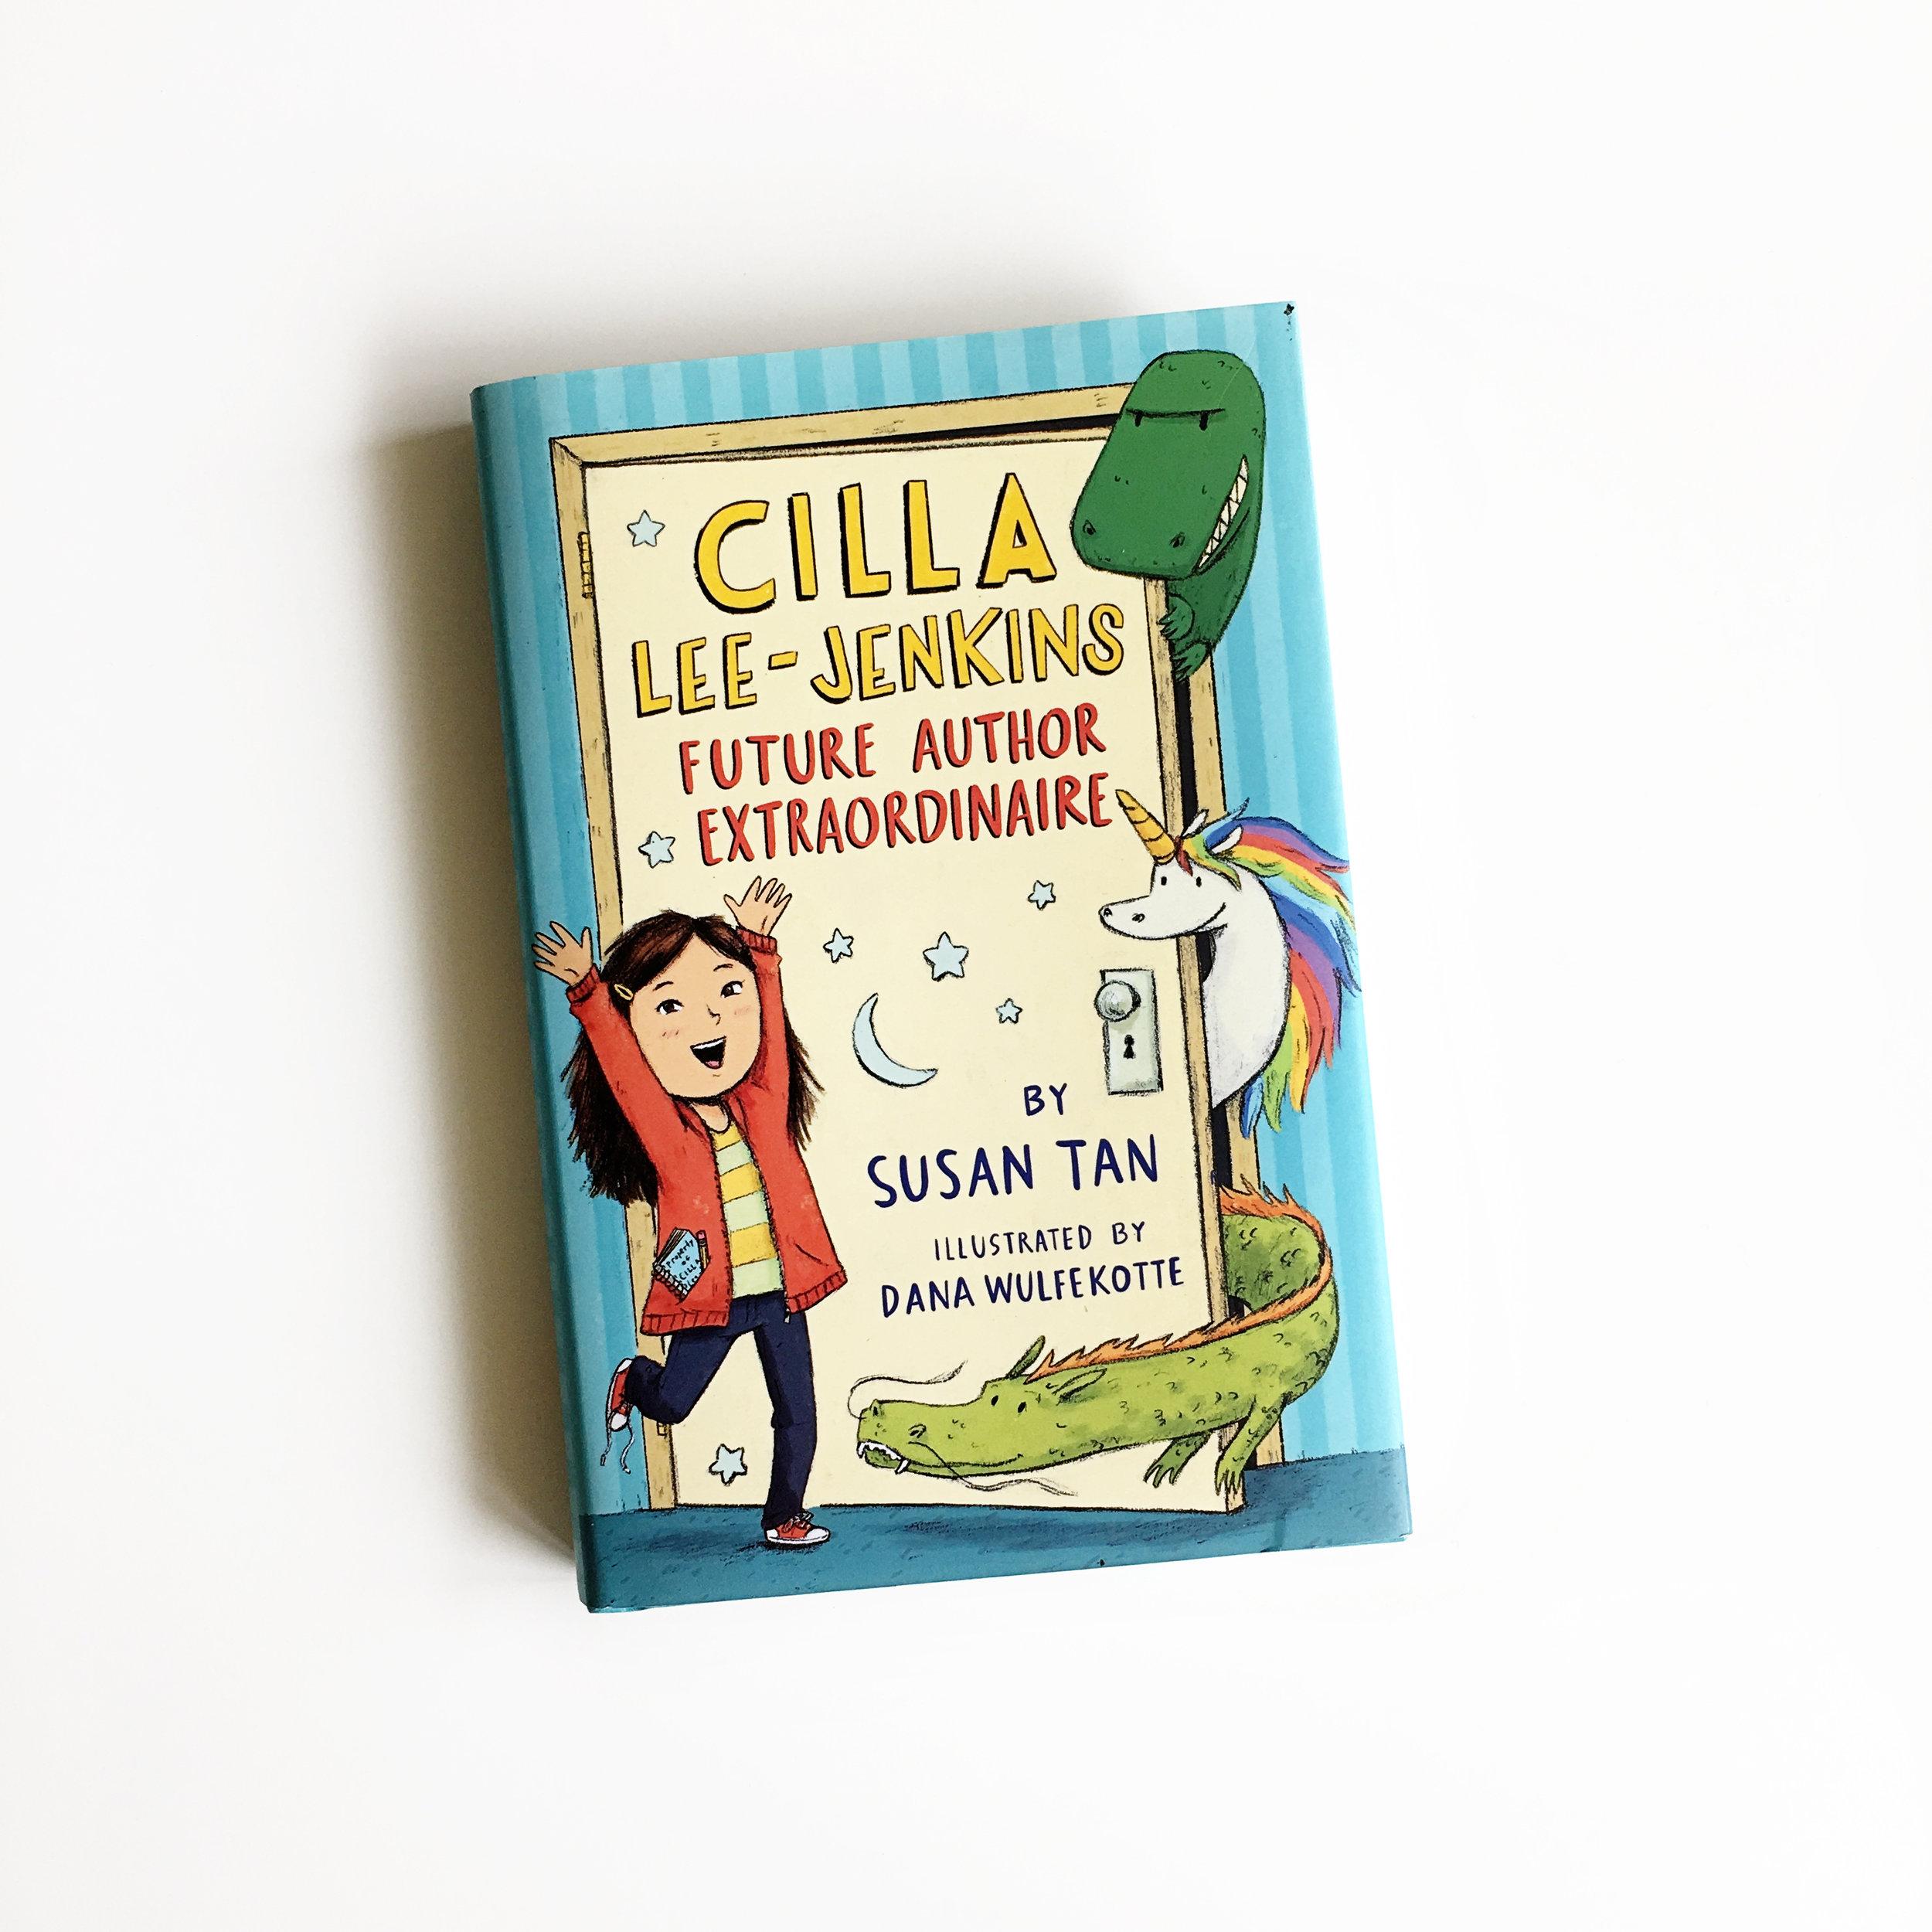 Cilla-Lee Jenkins: Future Author Extraordinaire | Little Lit Book Series